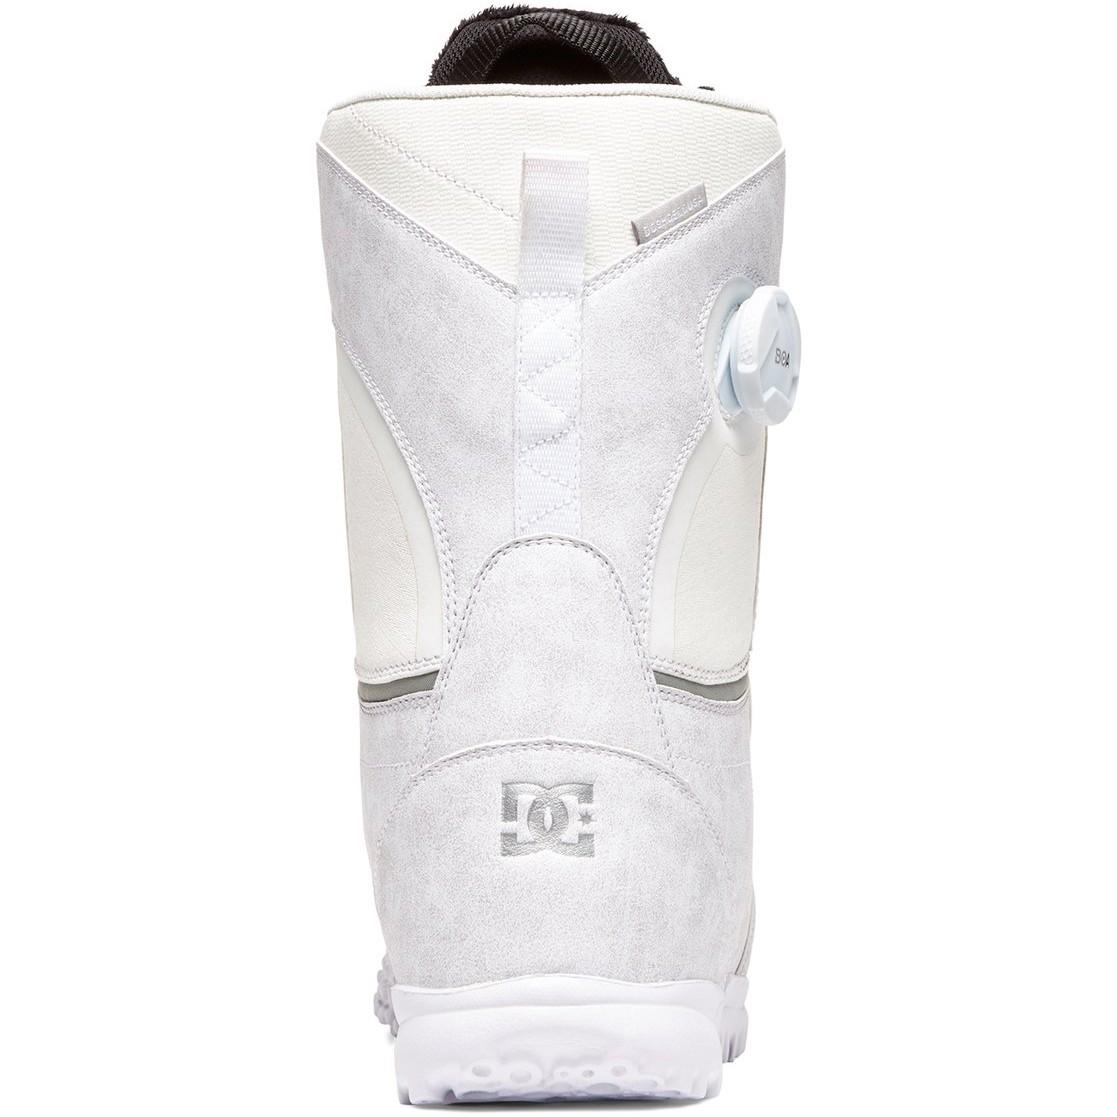 Ботинки для сноуборда DC LOTUS BOA X 19-20, White